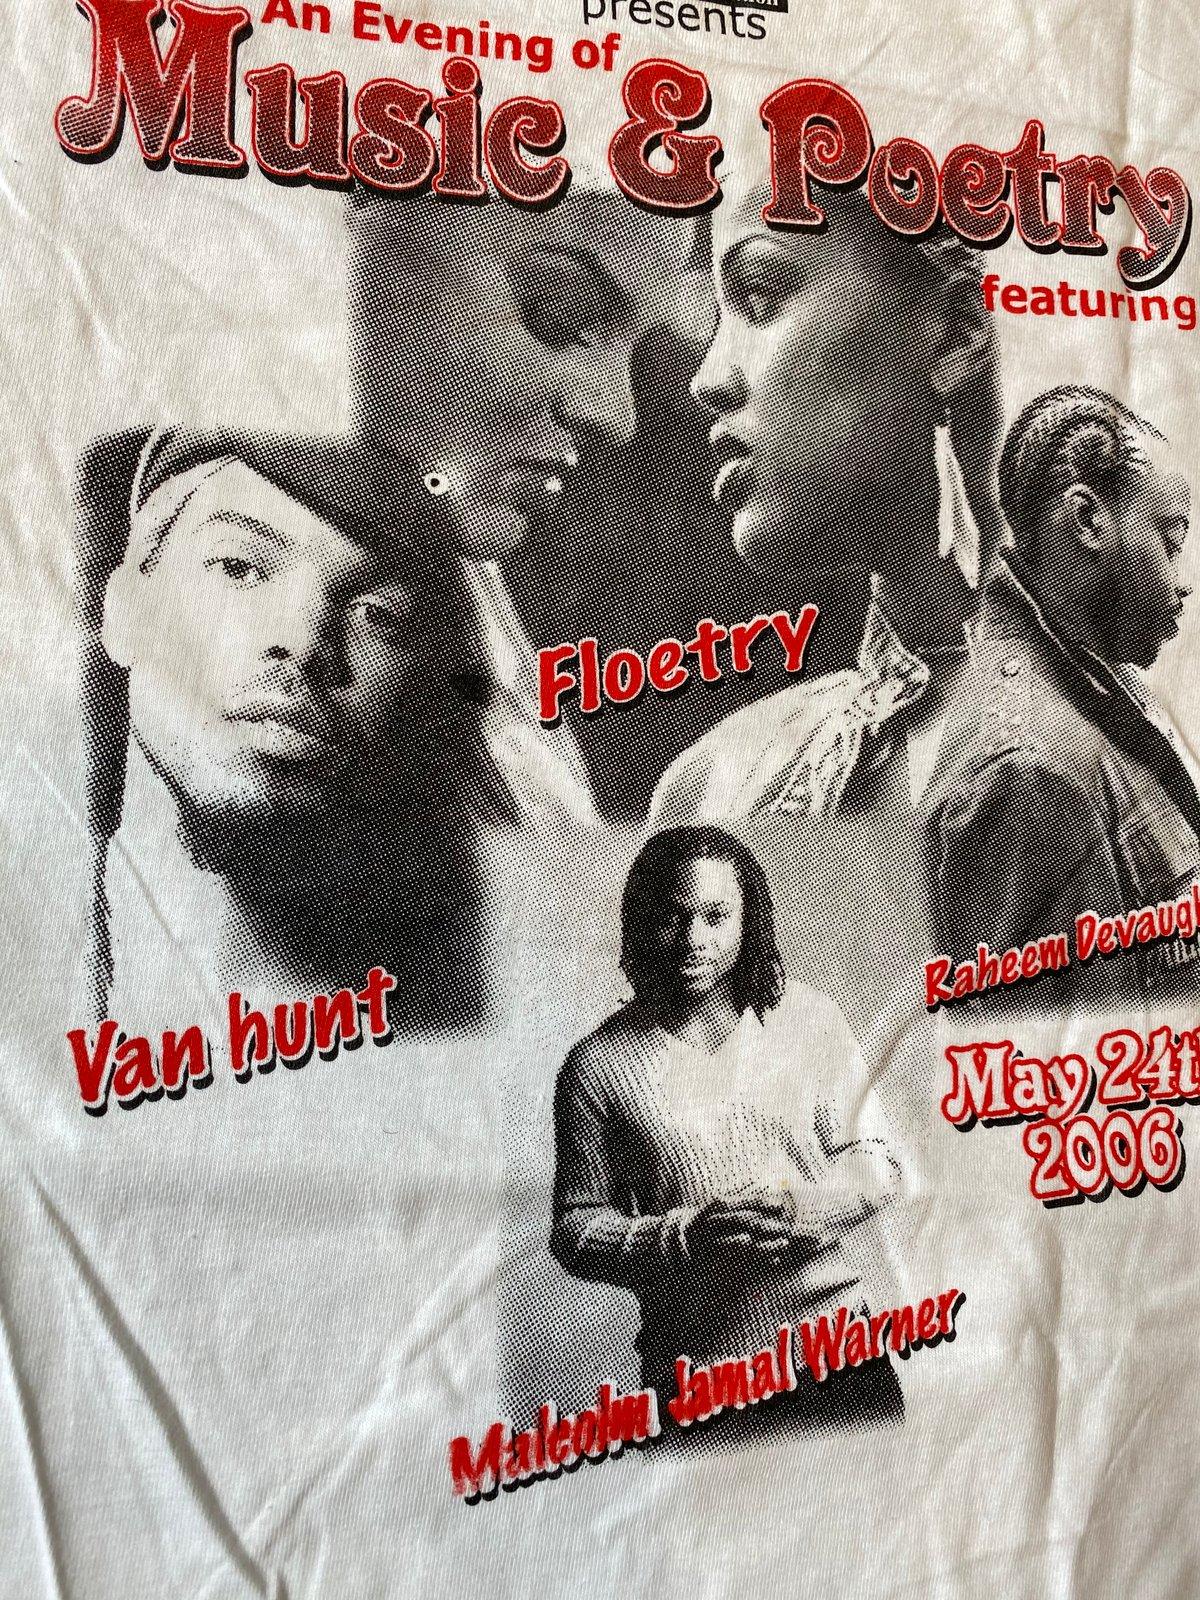 Image of 2006 ATL Music & Poetry Fest Tee